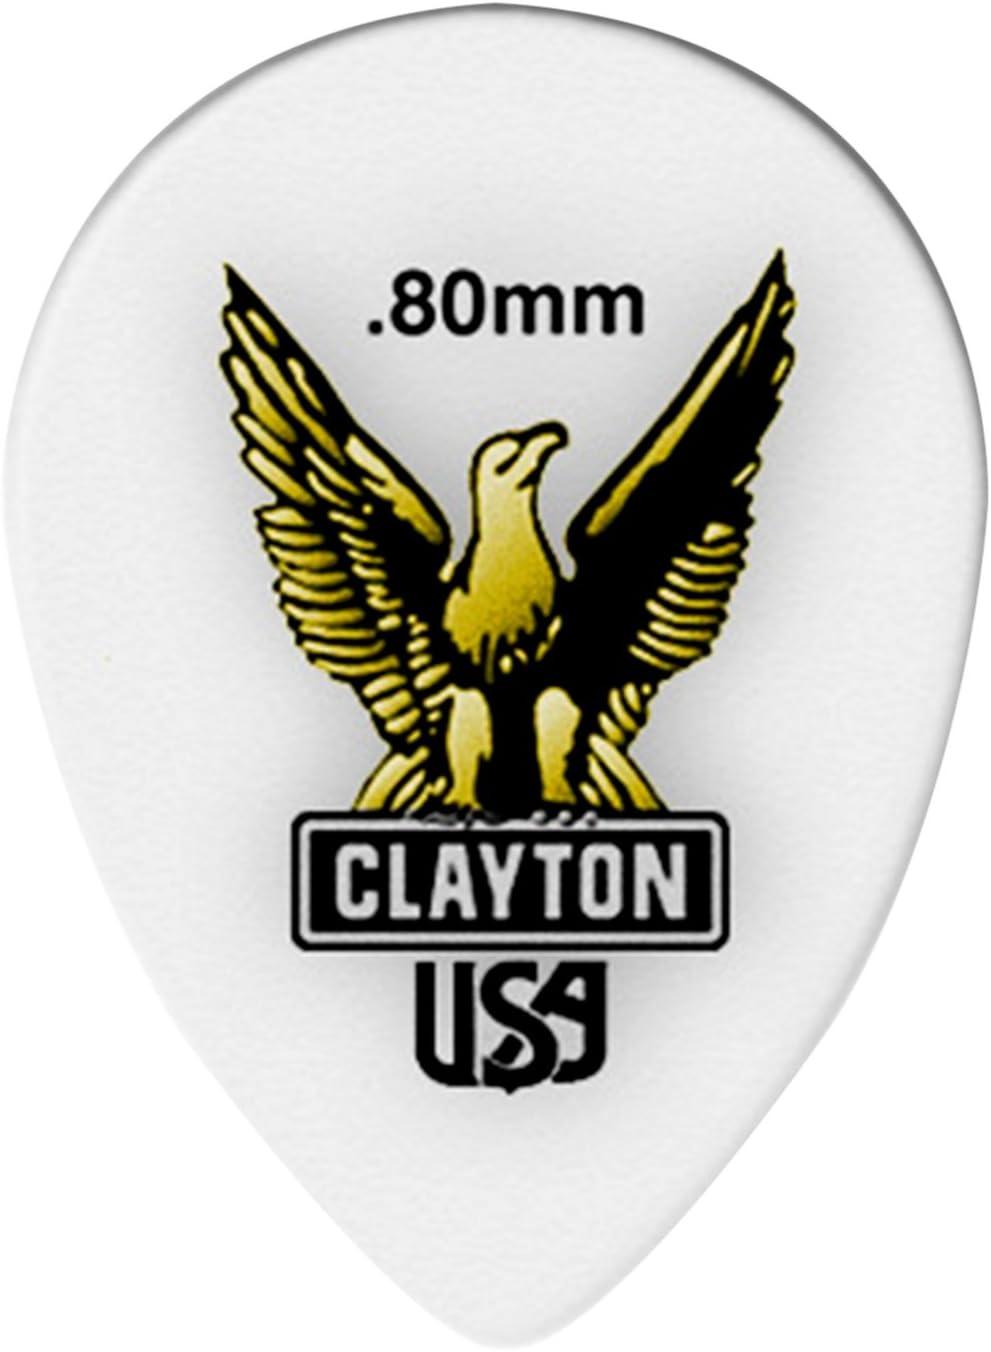 Clayton Acetal Small Teardrop Guitar Picks .80 mm 1 Dozen